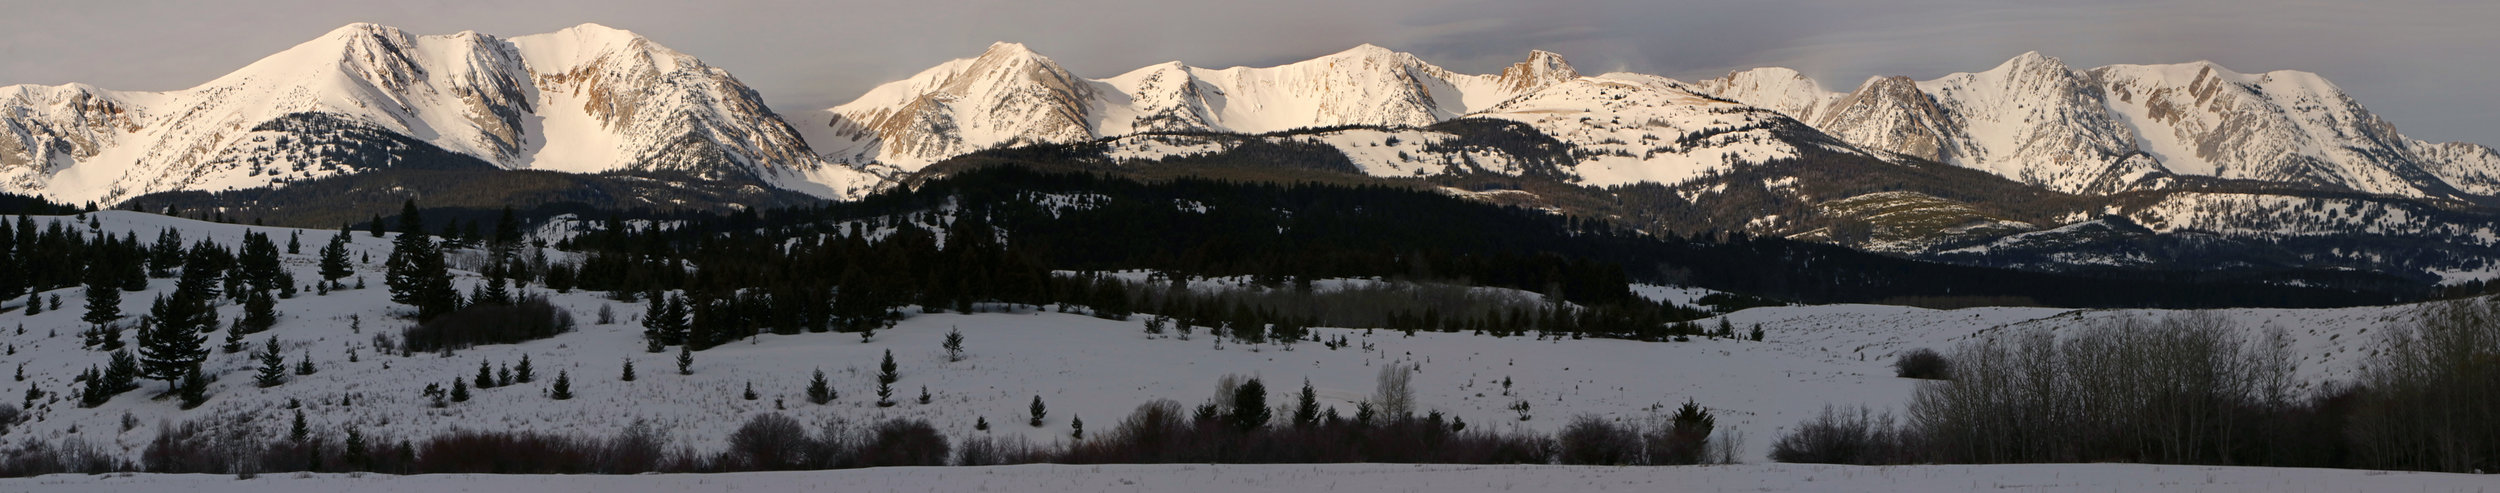 Bridger Range, MT